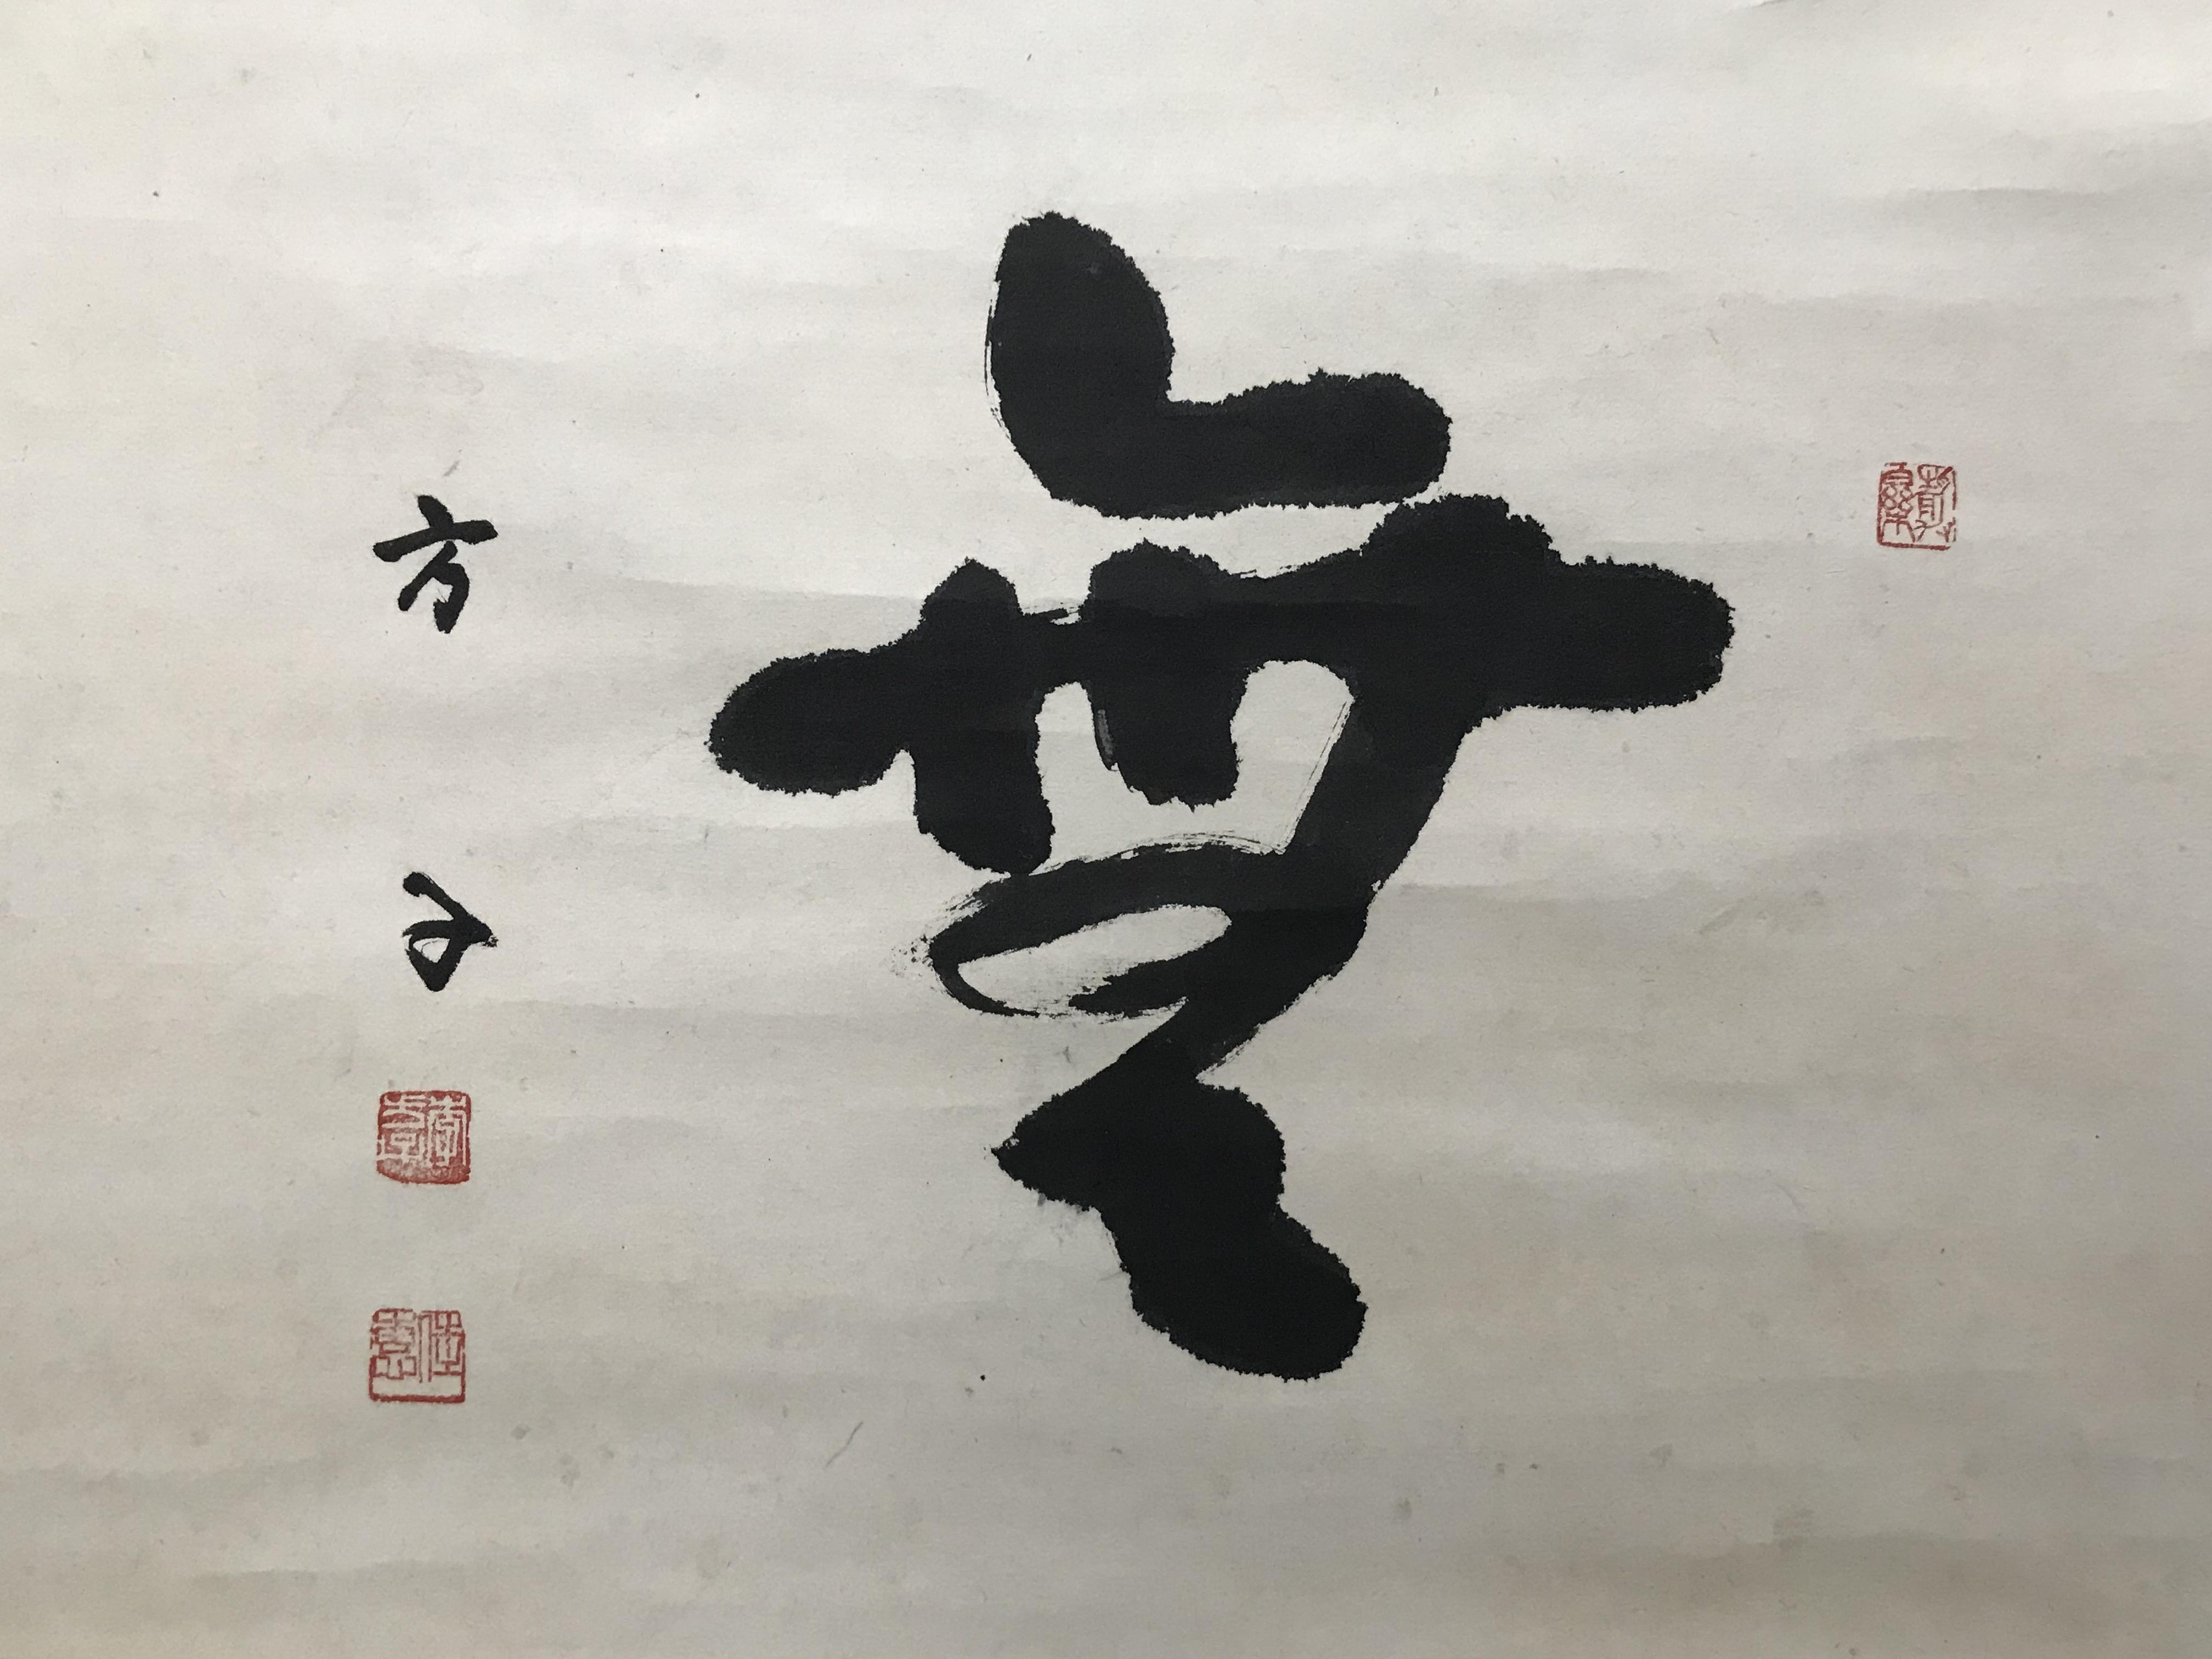 李方子 「無」一字 書 の掛軸